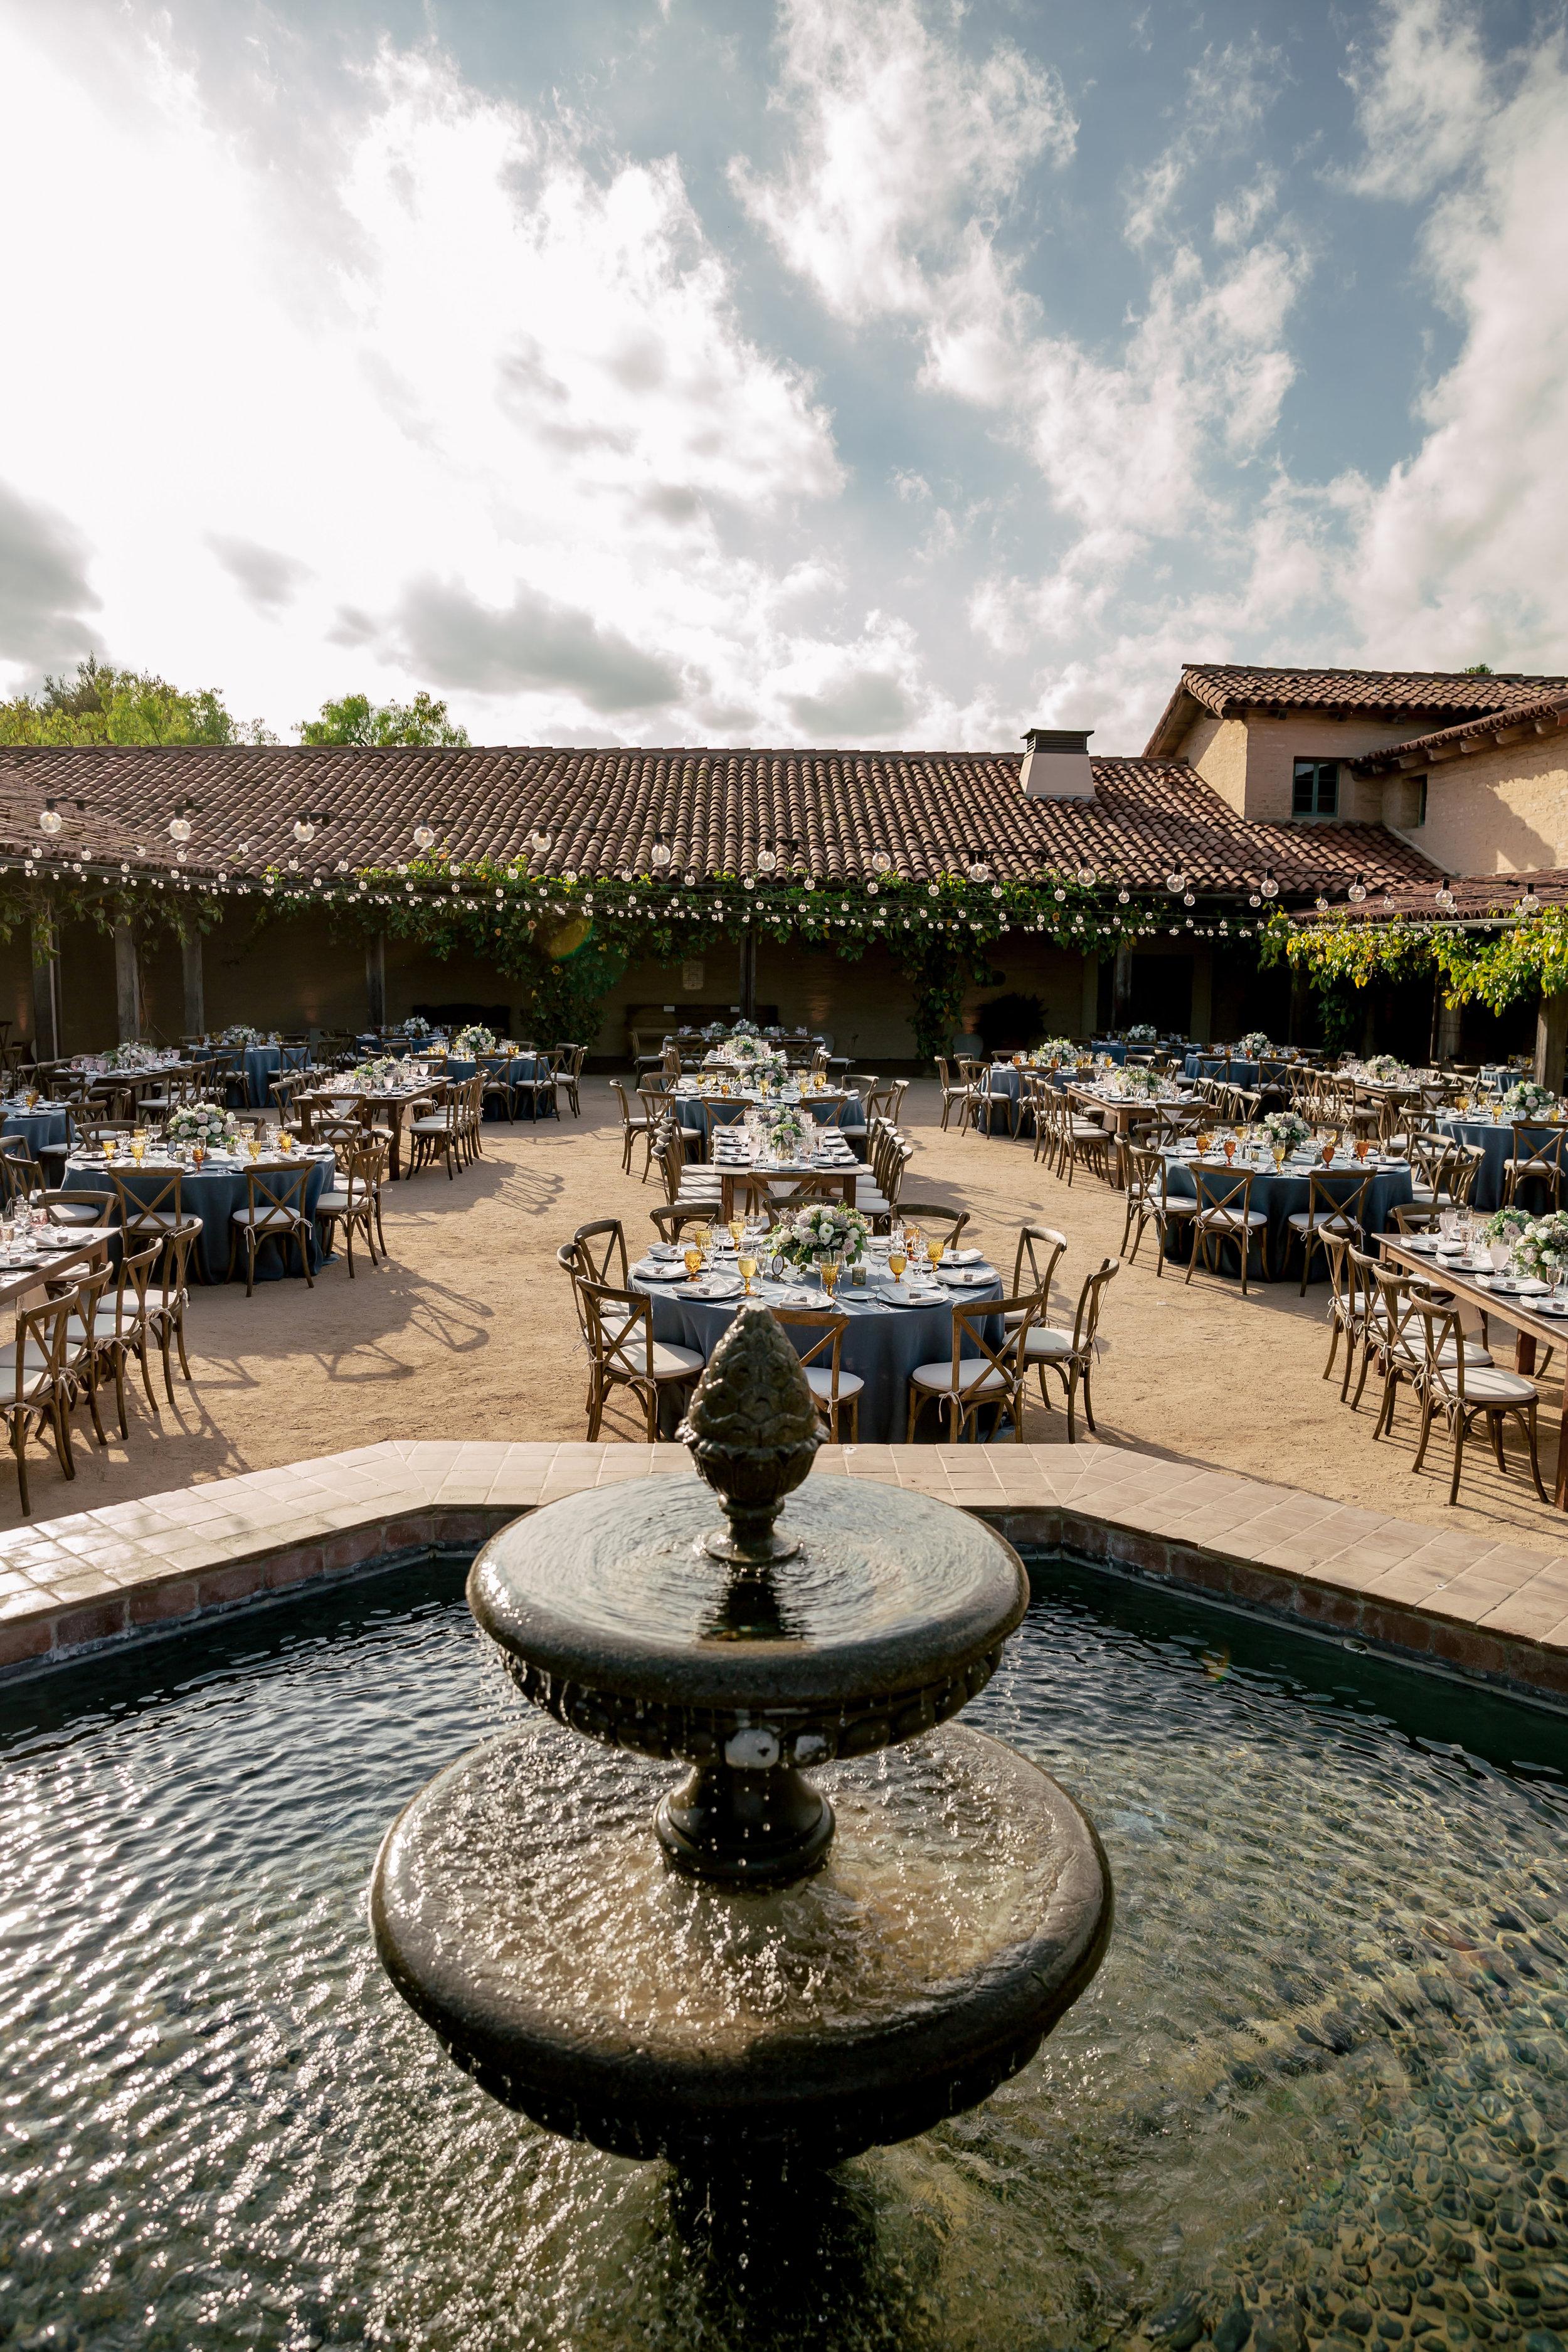 www.santabarbarawedding.com | Rewind Photography | Events by M and M | Santa Barbara Historical Museum | Reception